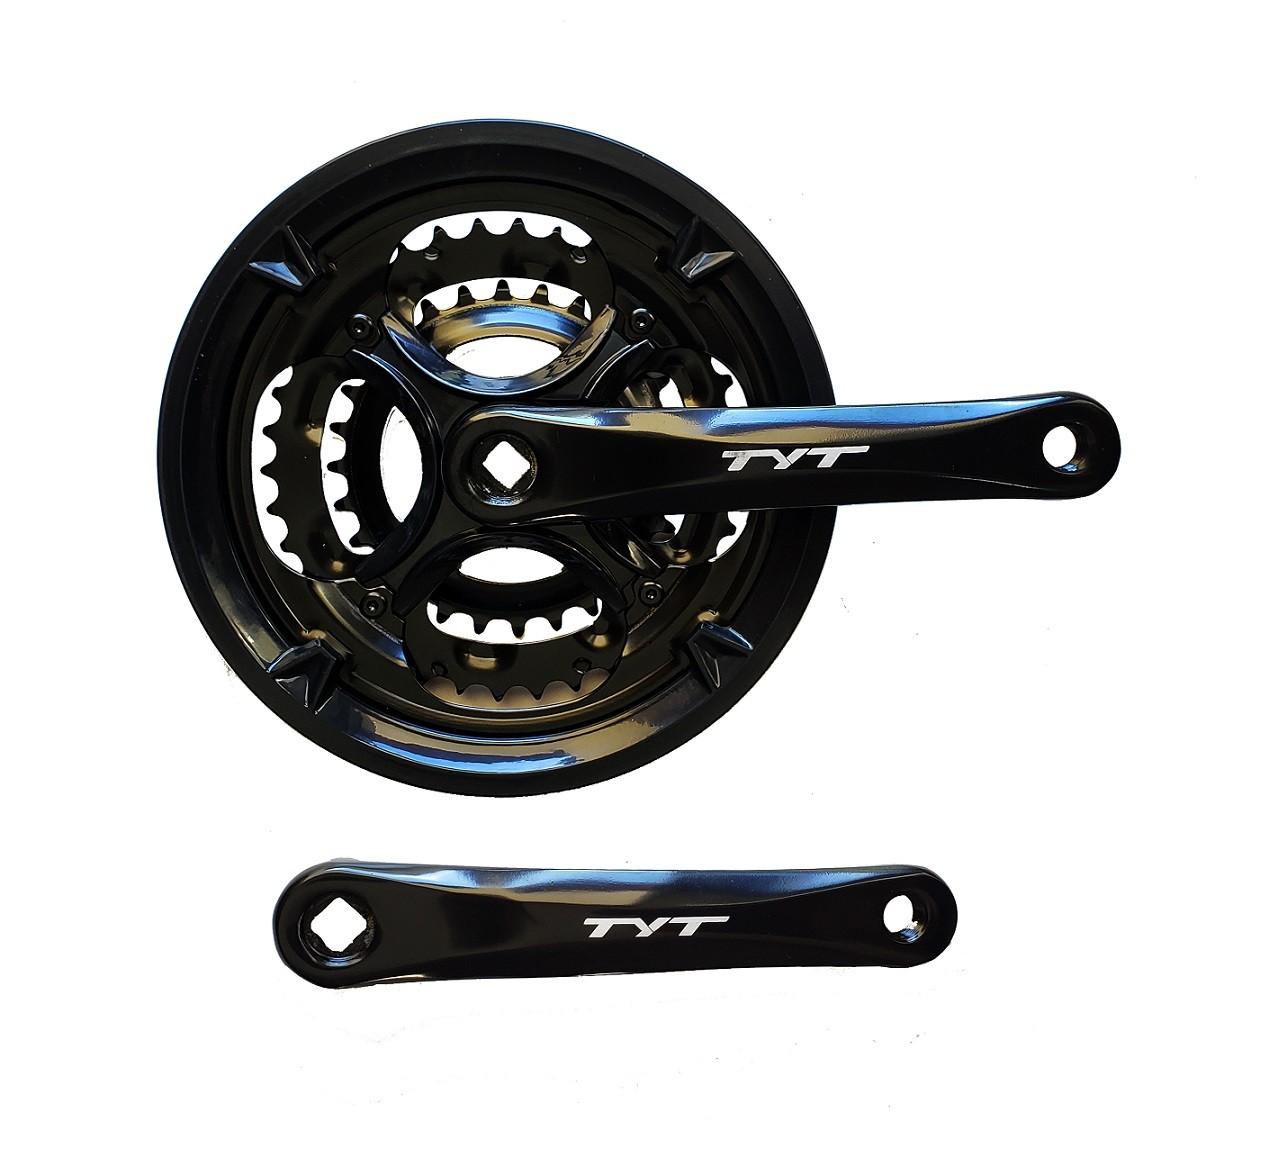 Pedivela Bicicleta Alumínio Triplo TYT 42x34x24 6,7,8v MTB